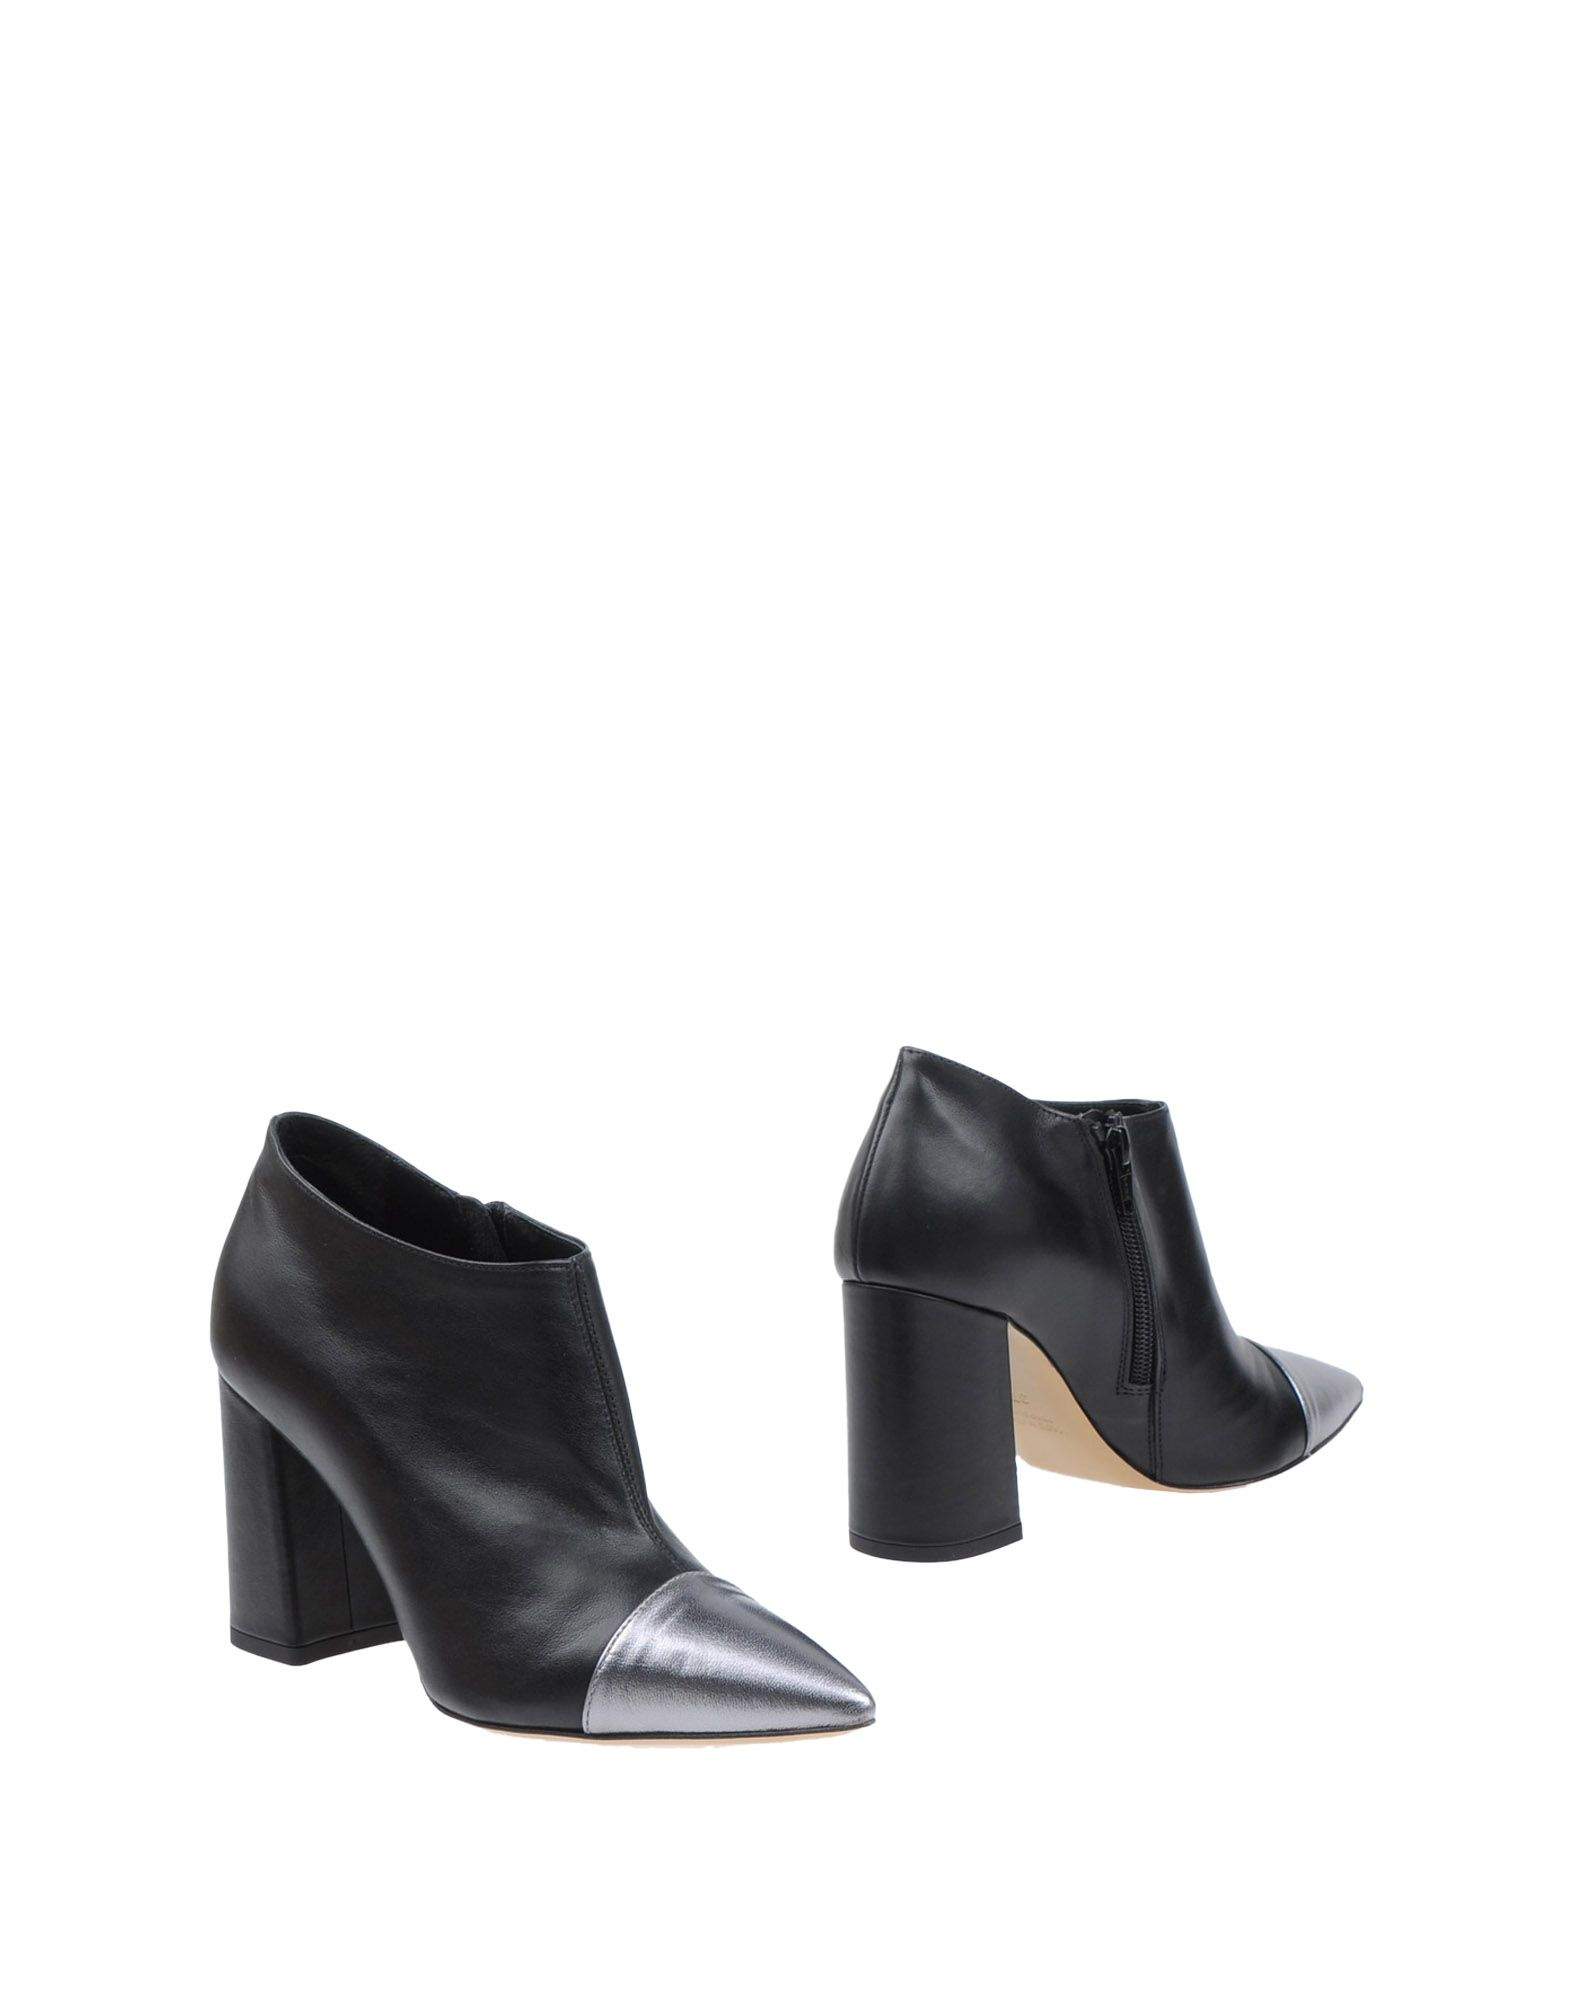 FAUZIAN JEUNESSE Damen Ankle Boot Farbe Schwarz Größe 9